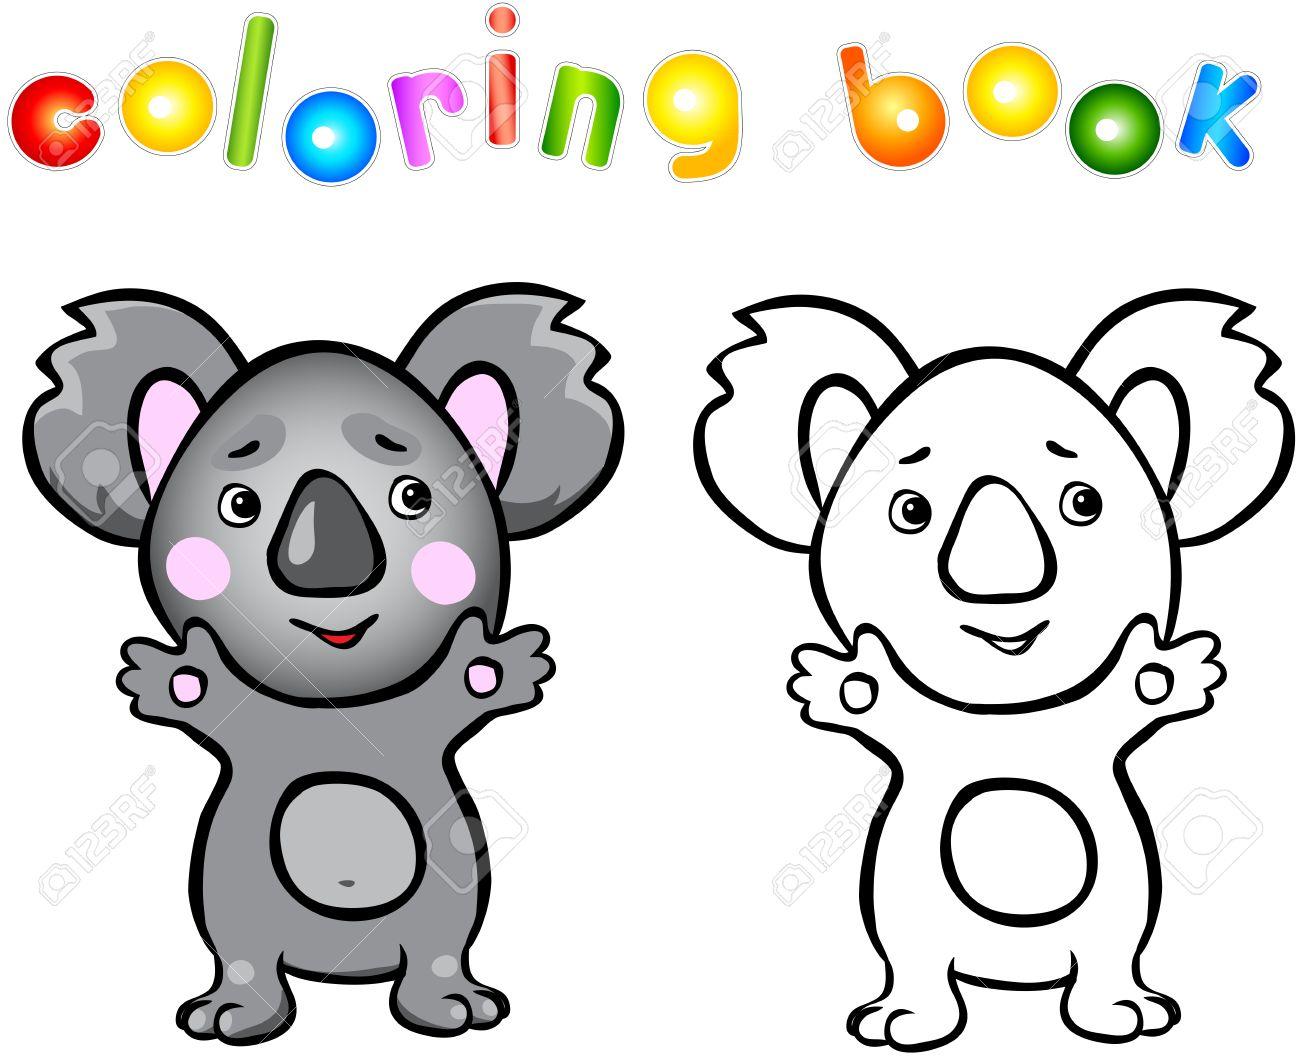 Libro Para Colorear Koala De Dibujos Animados Divertido Ilustración Del Vector Para Niño